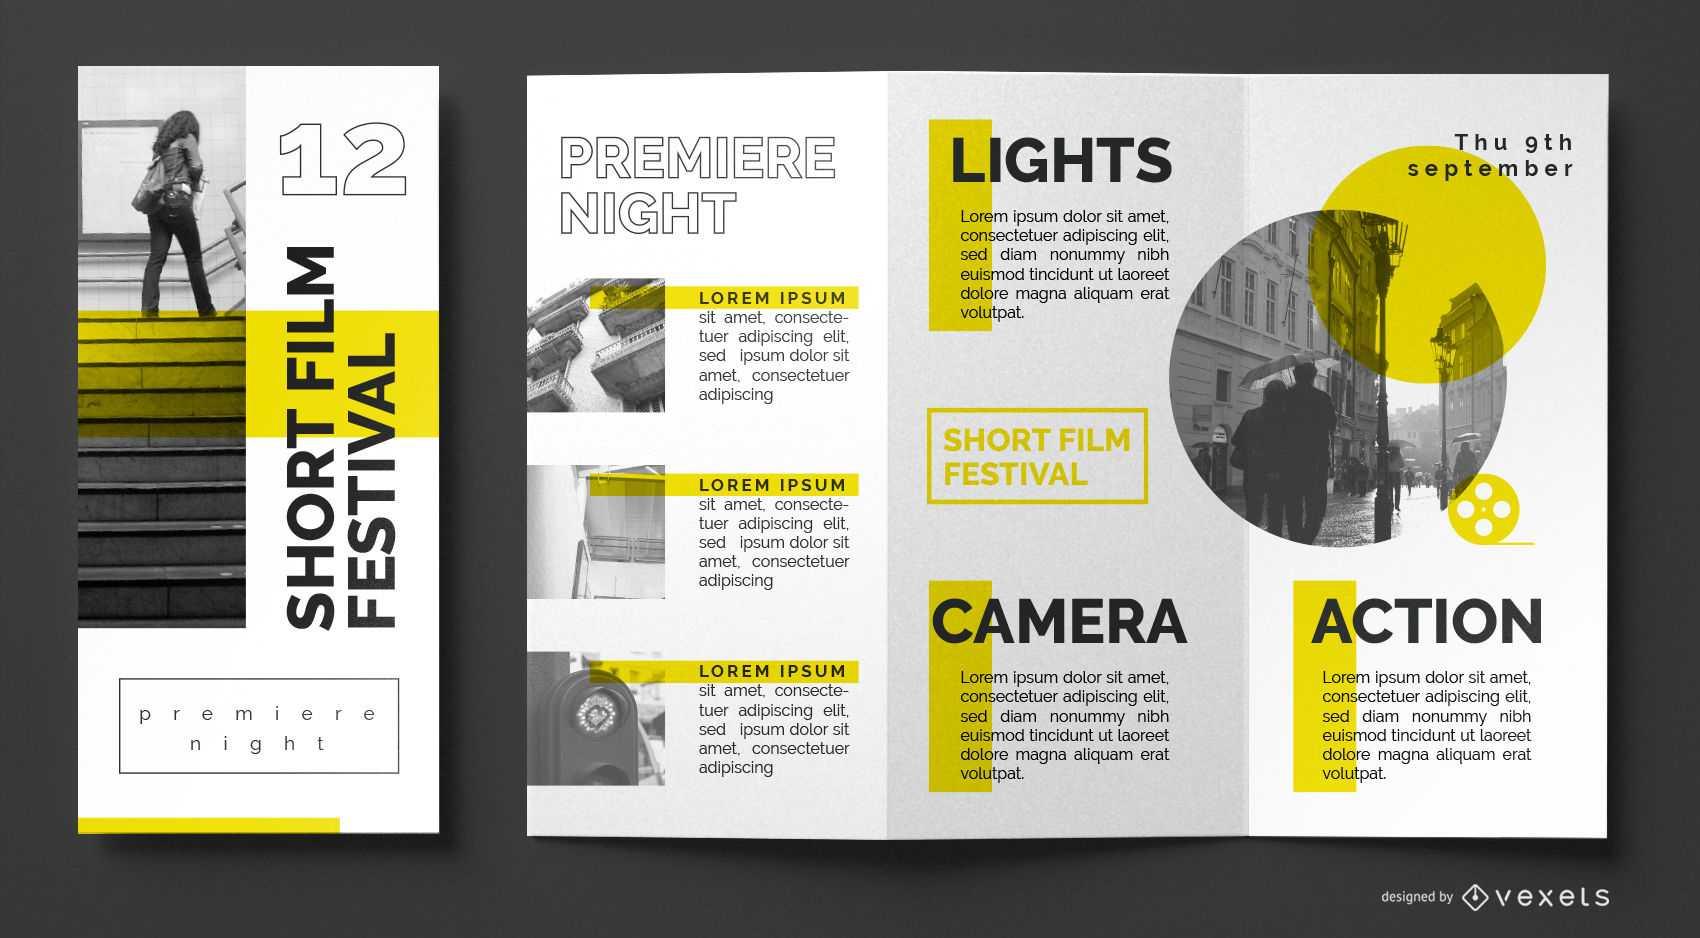 Film Festival Brochure Template - Vector Download With Film Festival Brochure Template